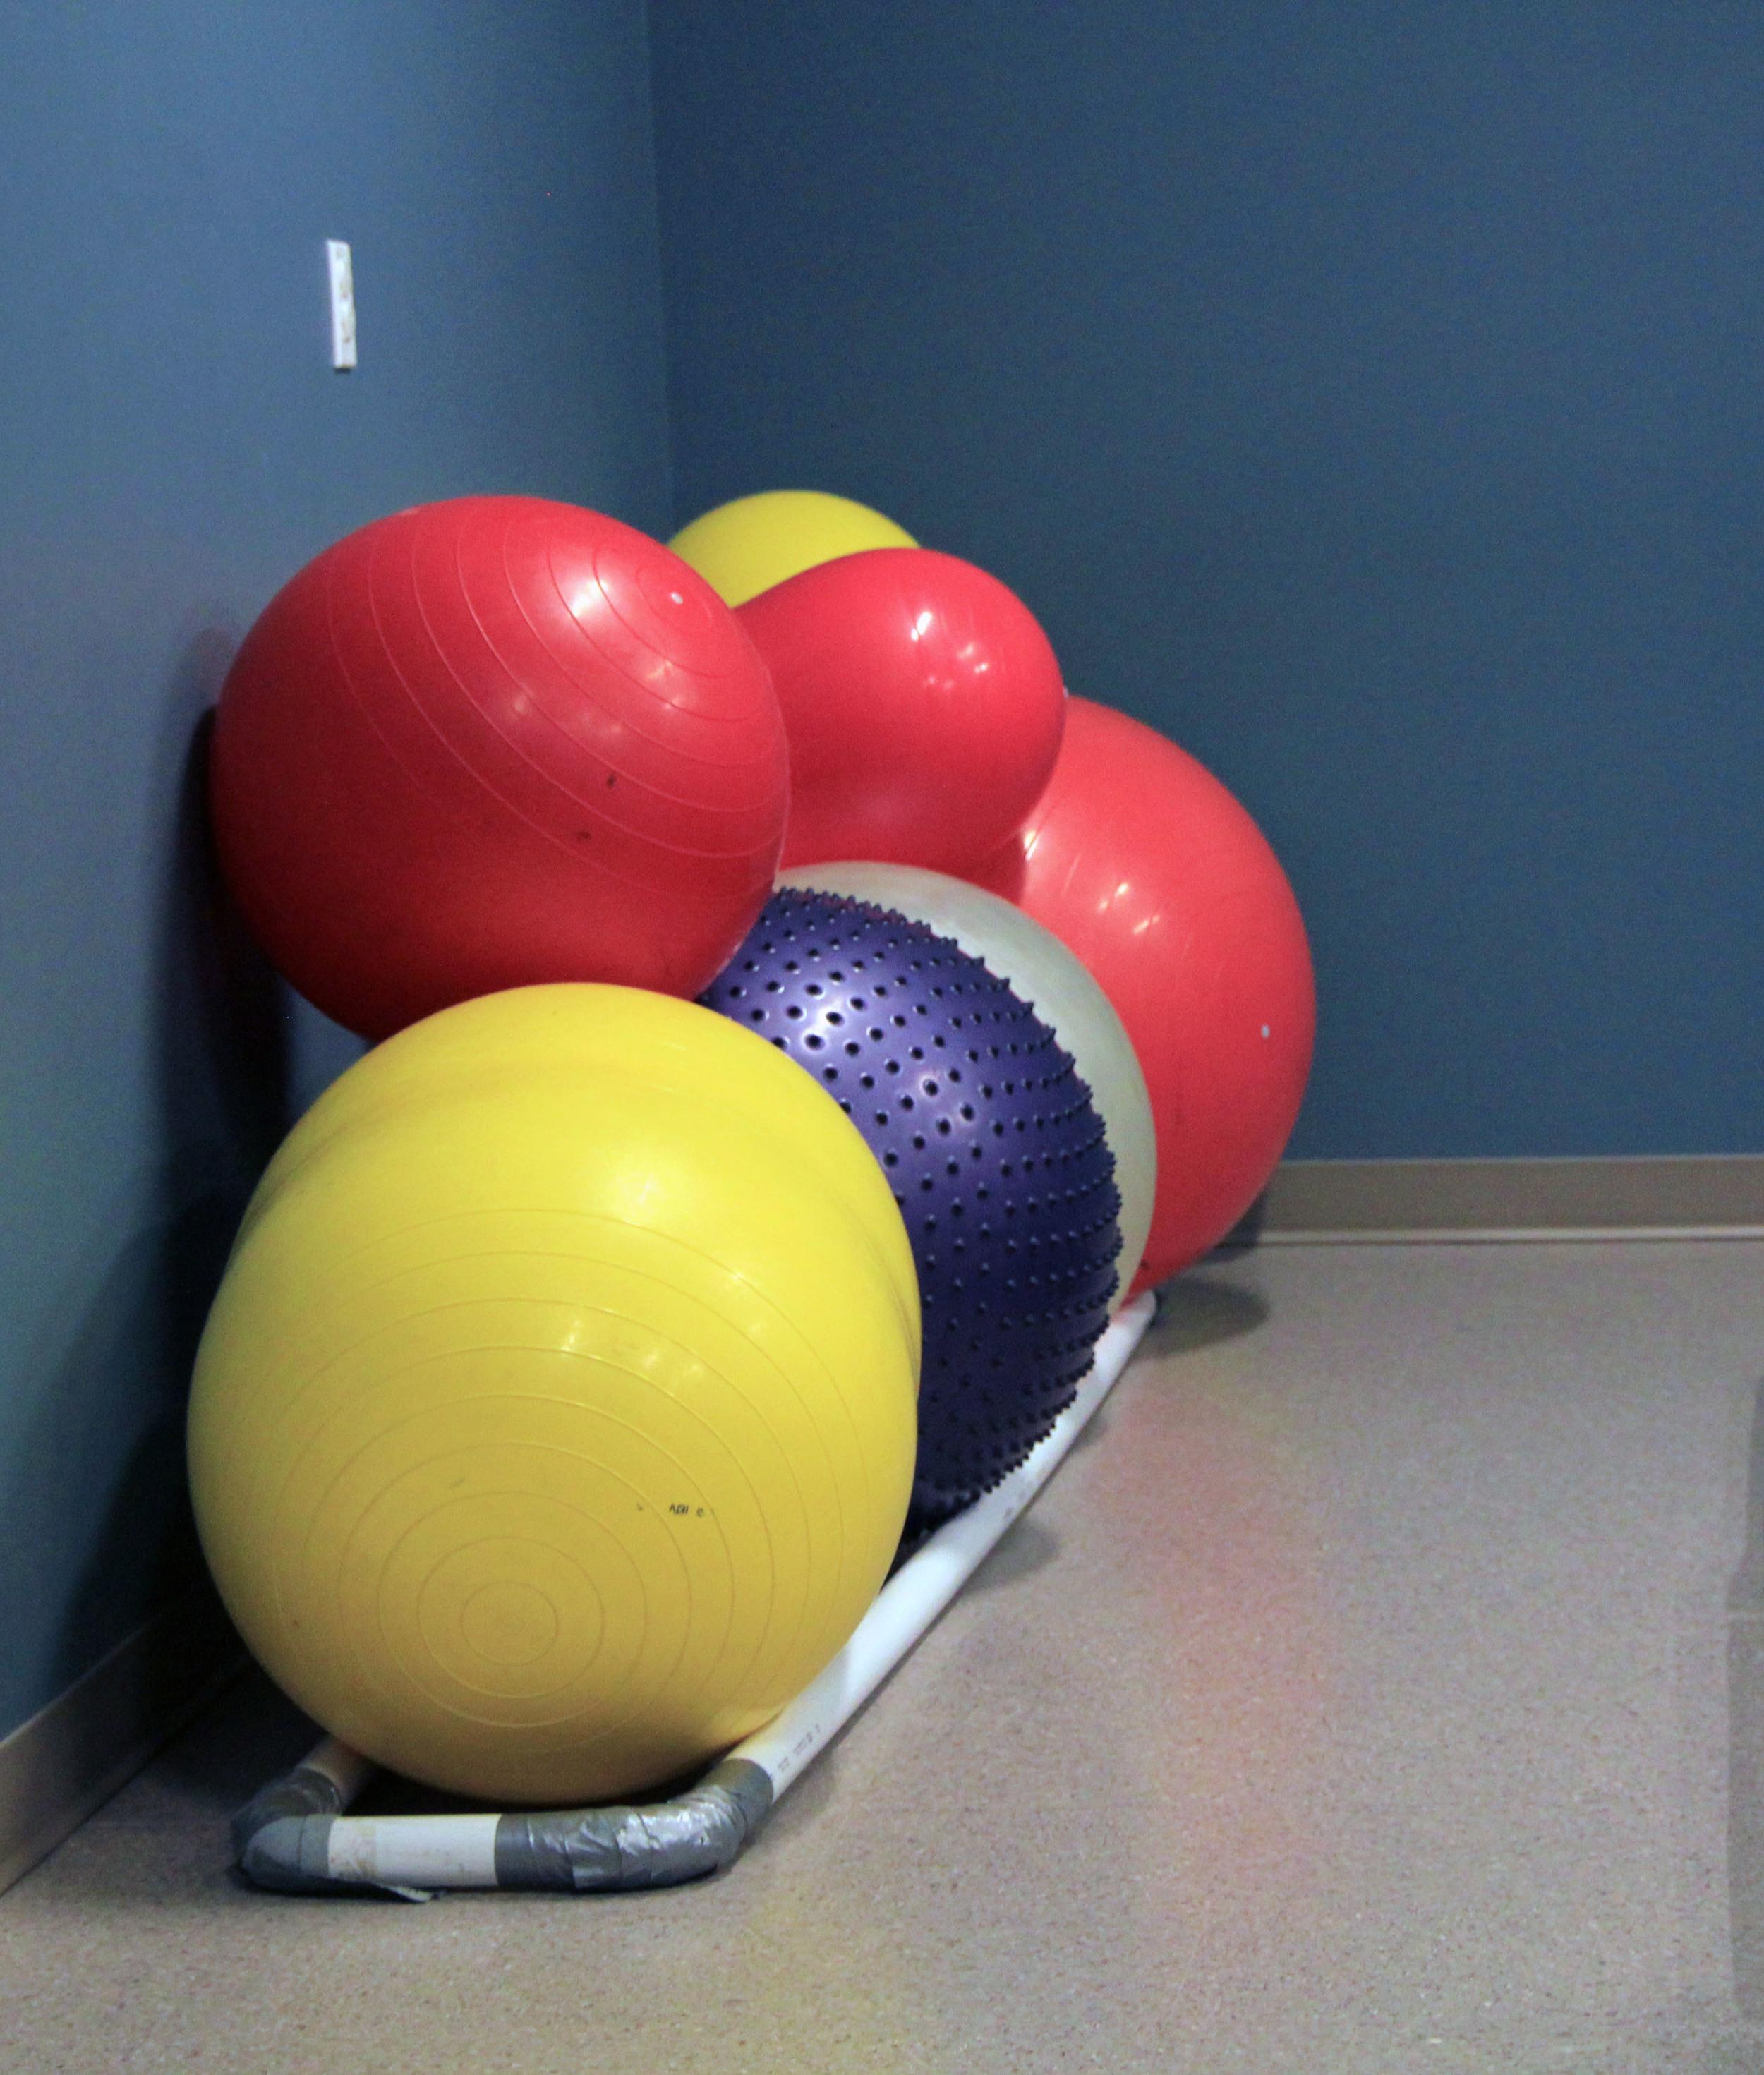 therapyballs.jpg